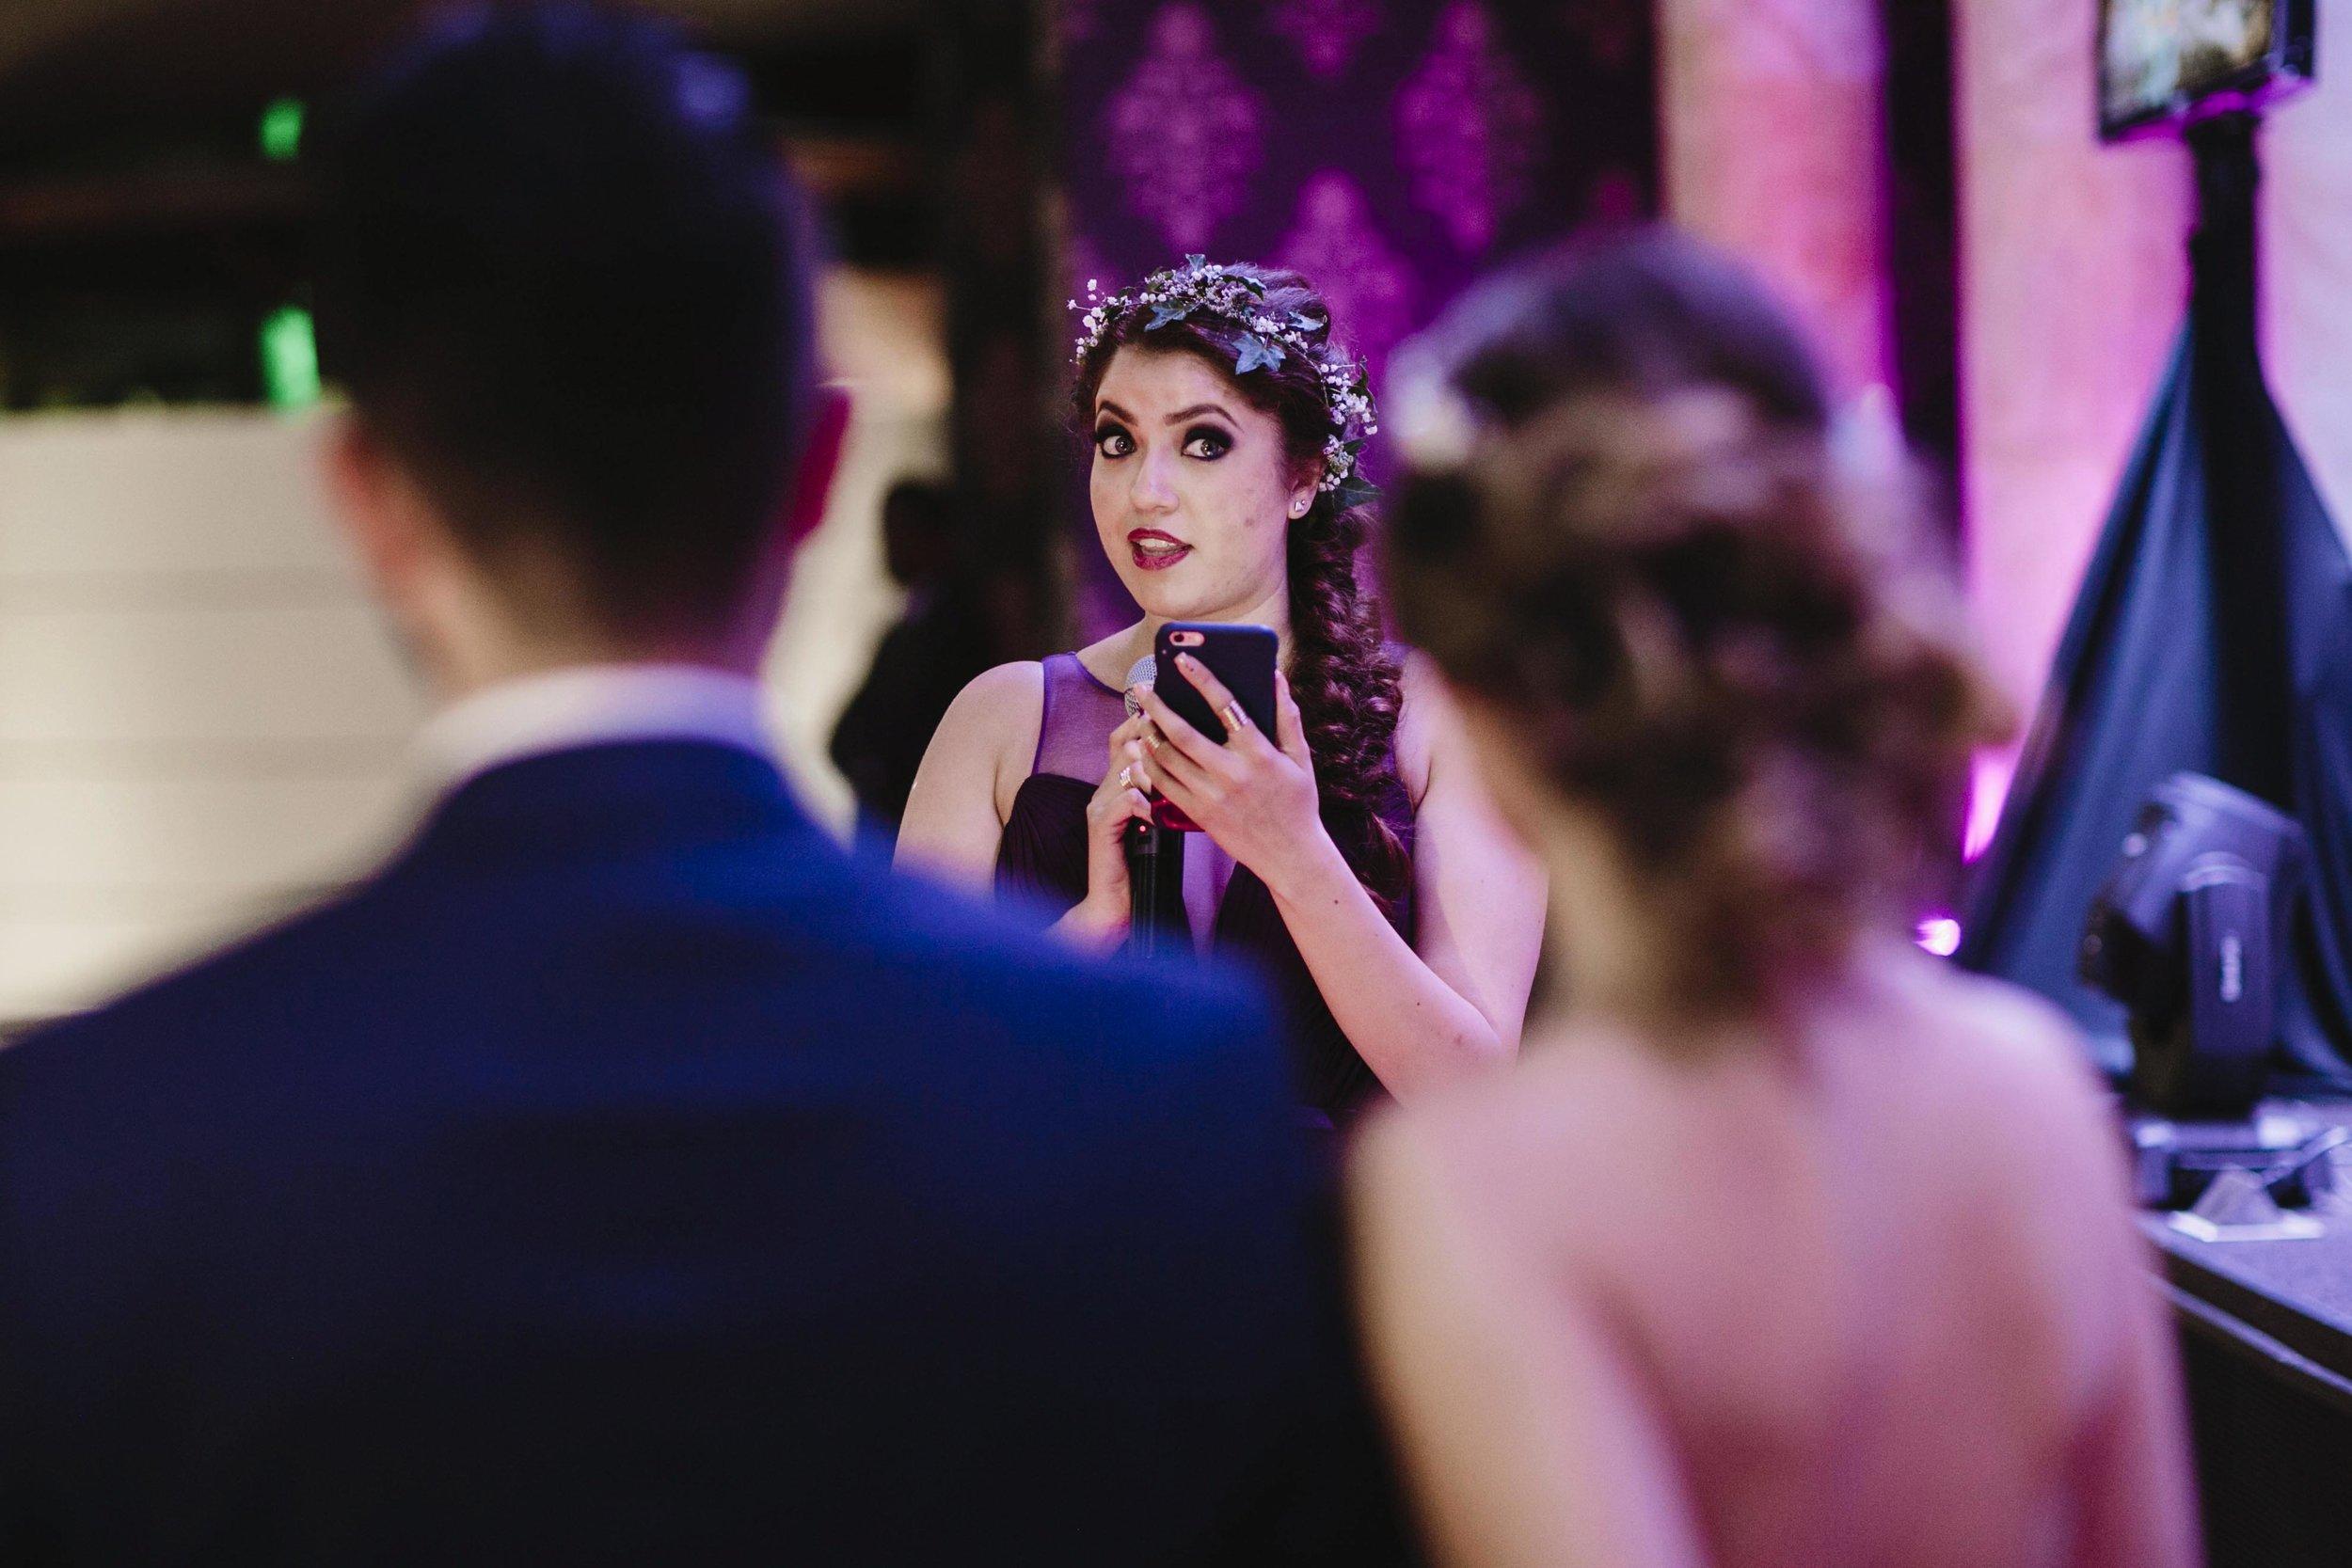 alfonso_flores_destination_wedding_photography_jardin_amarello_cuernavaca112.jpg